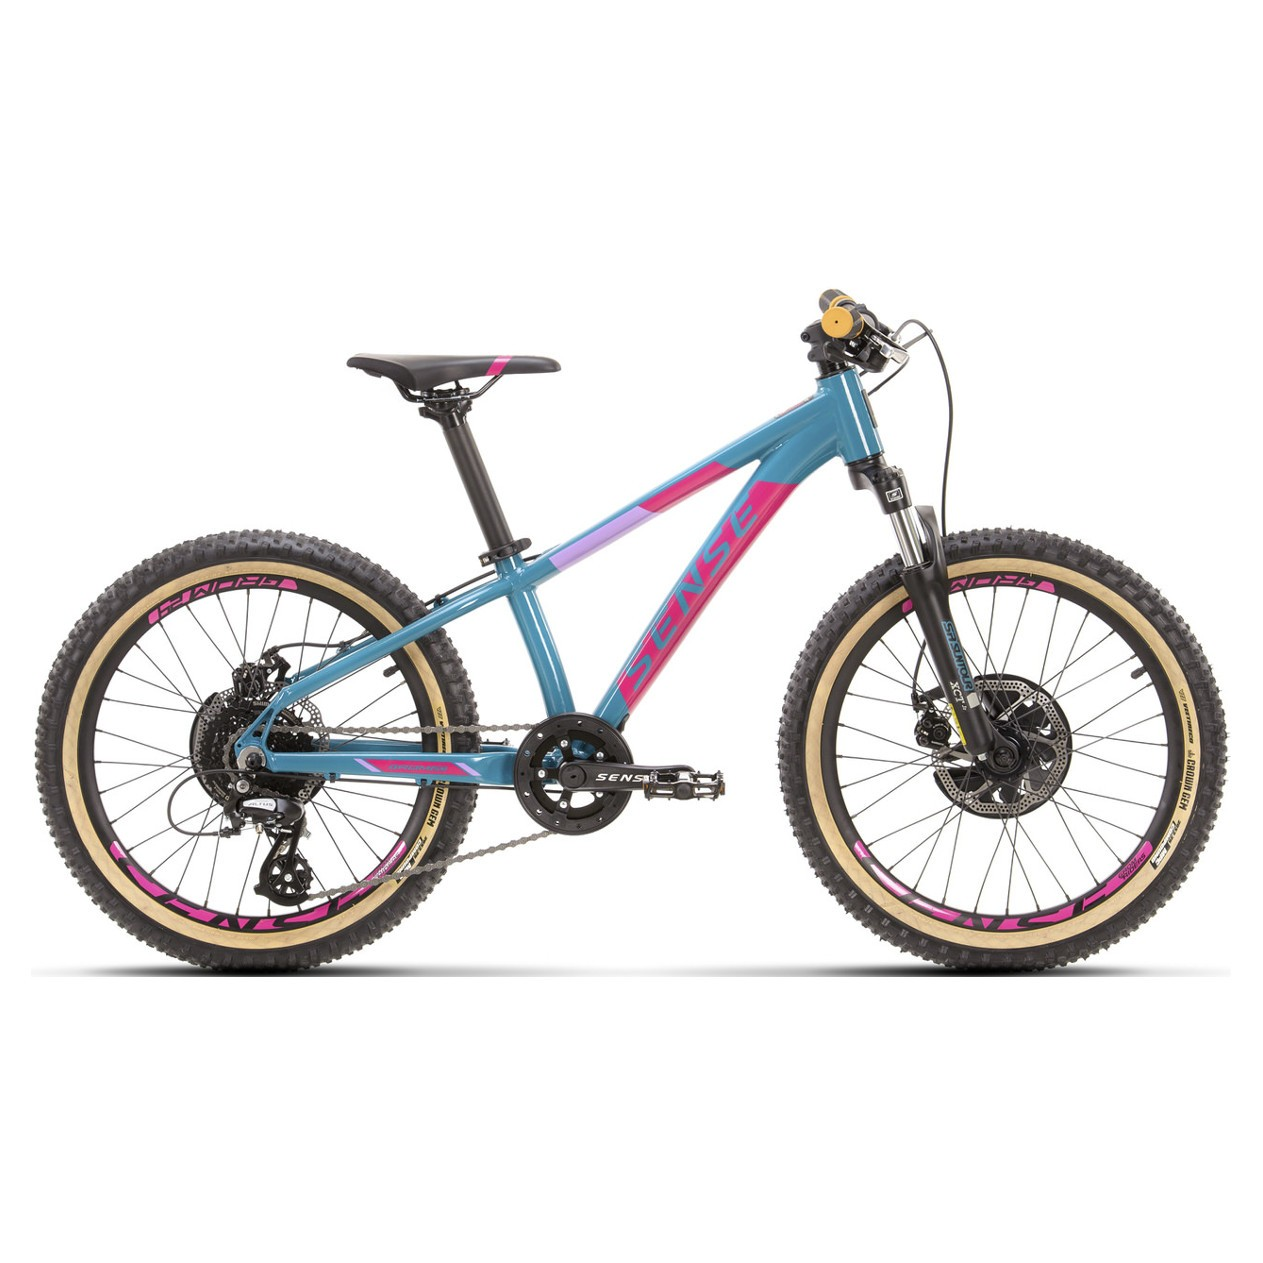 Bicicleta Infantil Sense Grom 20 2021